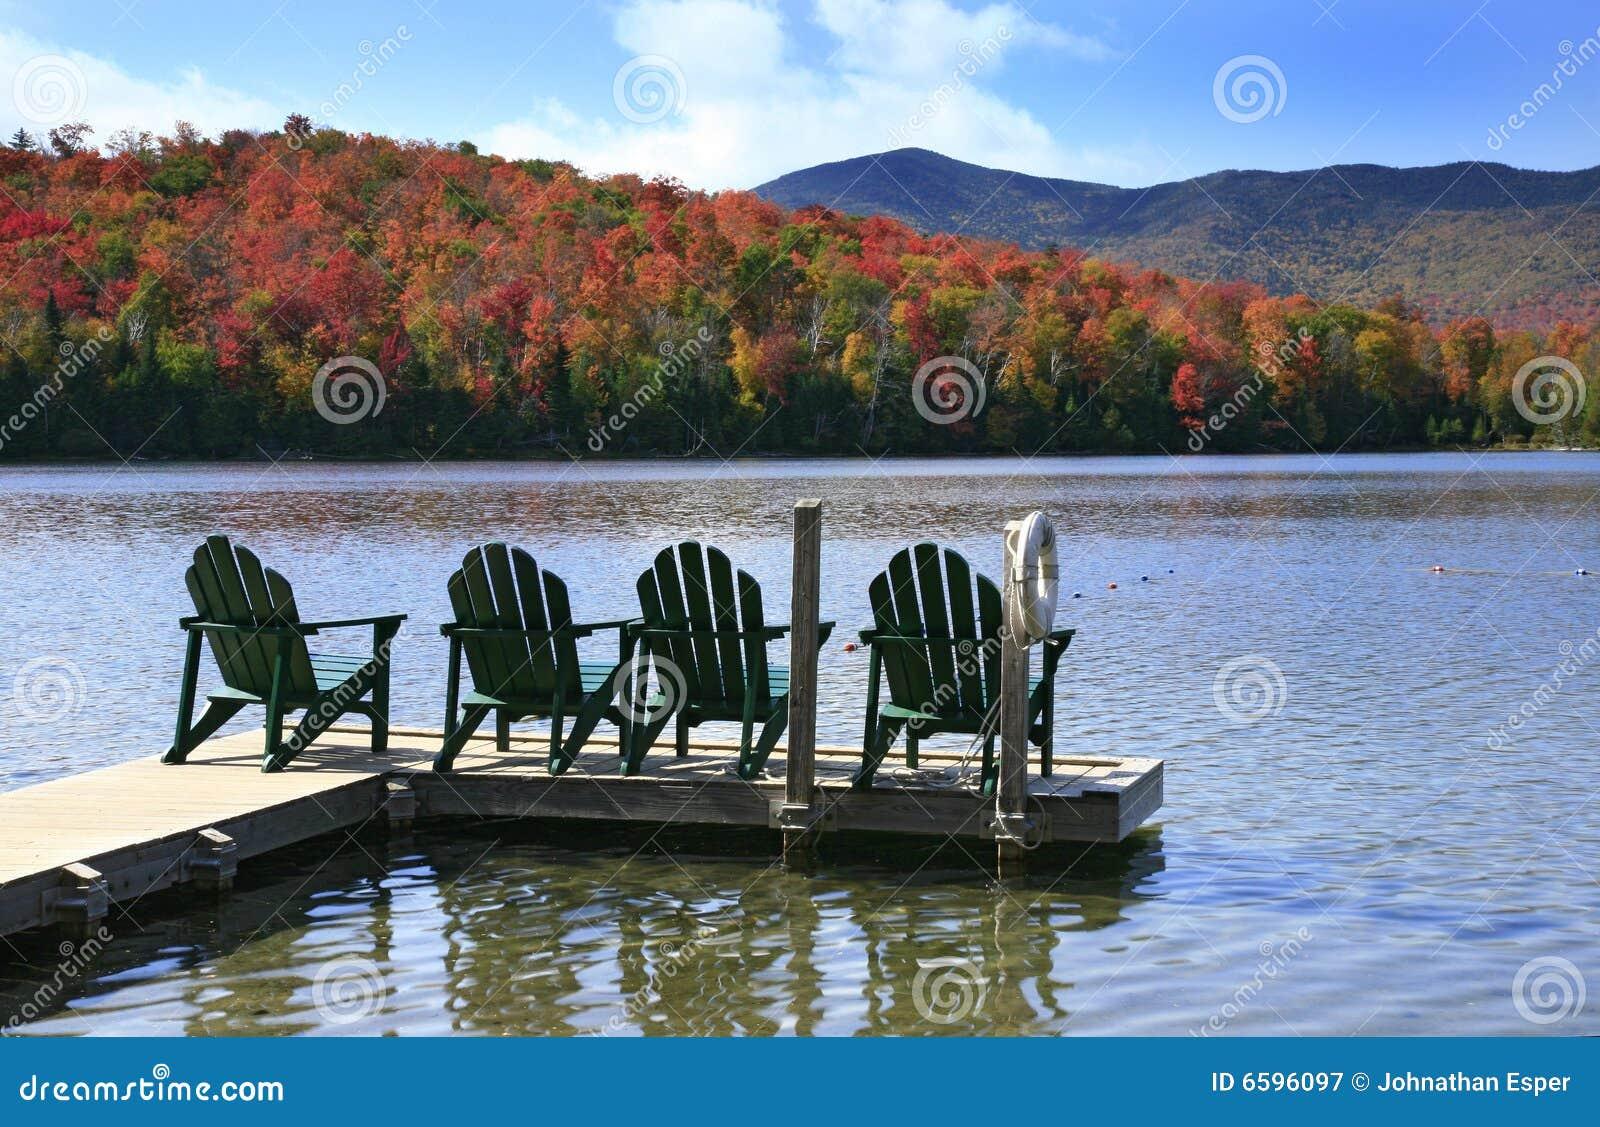 Adirondack chairs on lake stock image. Image of foliage ...